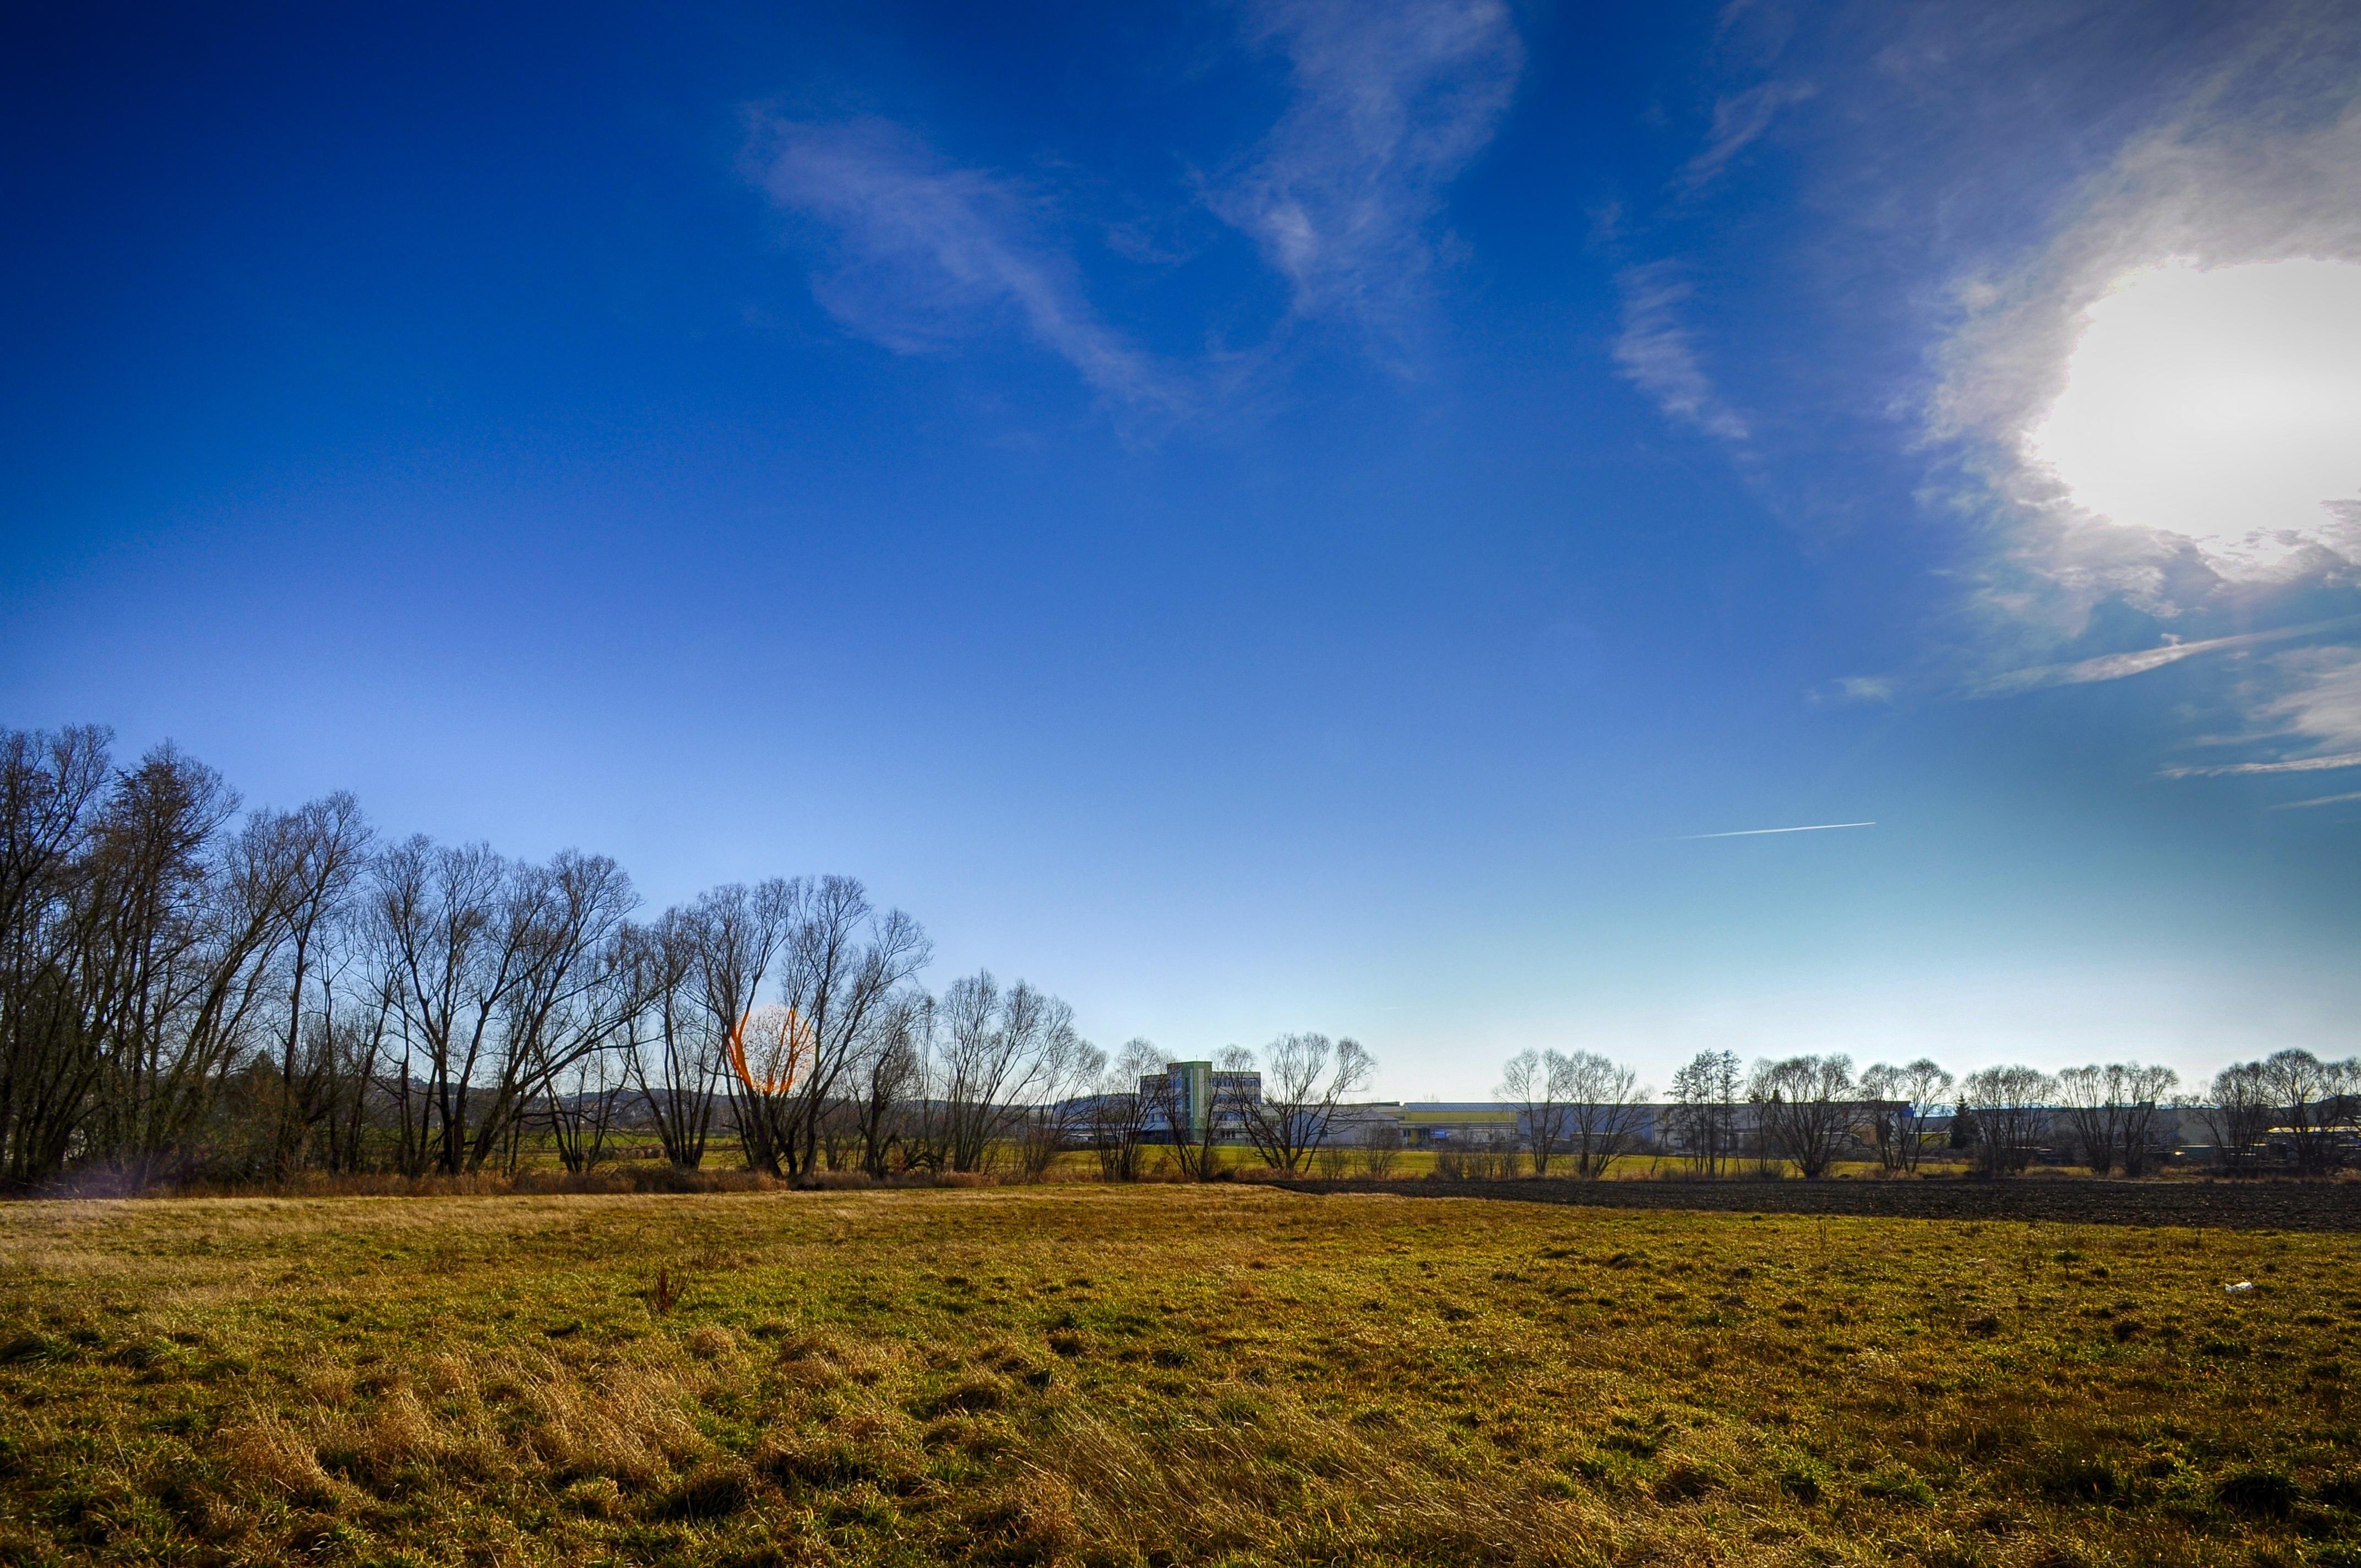 b7647c9b0509e Free Images : landscape, tree, nature, grass, horizon, cloud, sky, sun,  sunset, field, meadow, prairie, sunlight, morning, hill, dawn, dusk,  evening, spring ...